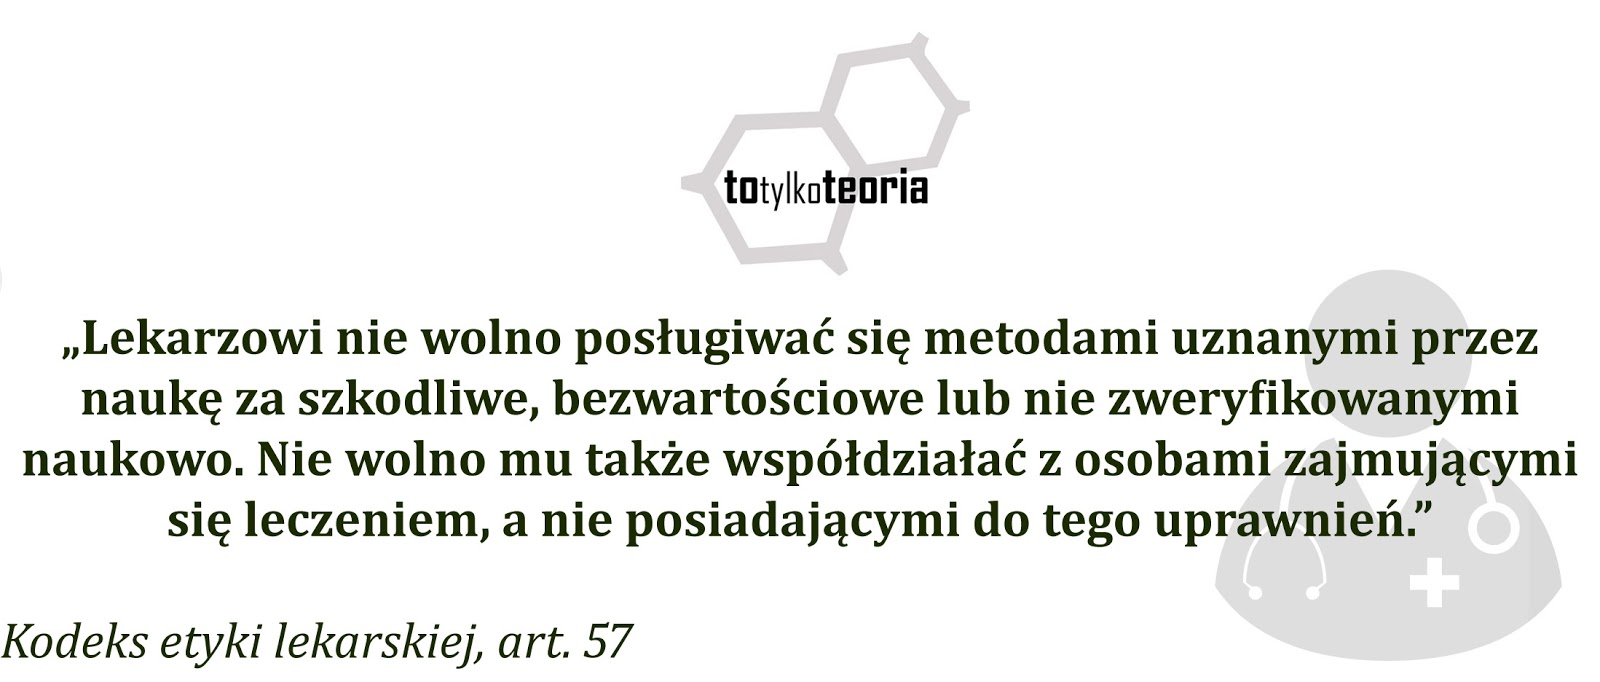 etyka lekarska doktor Kilarski